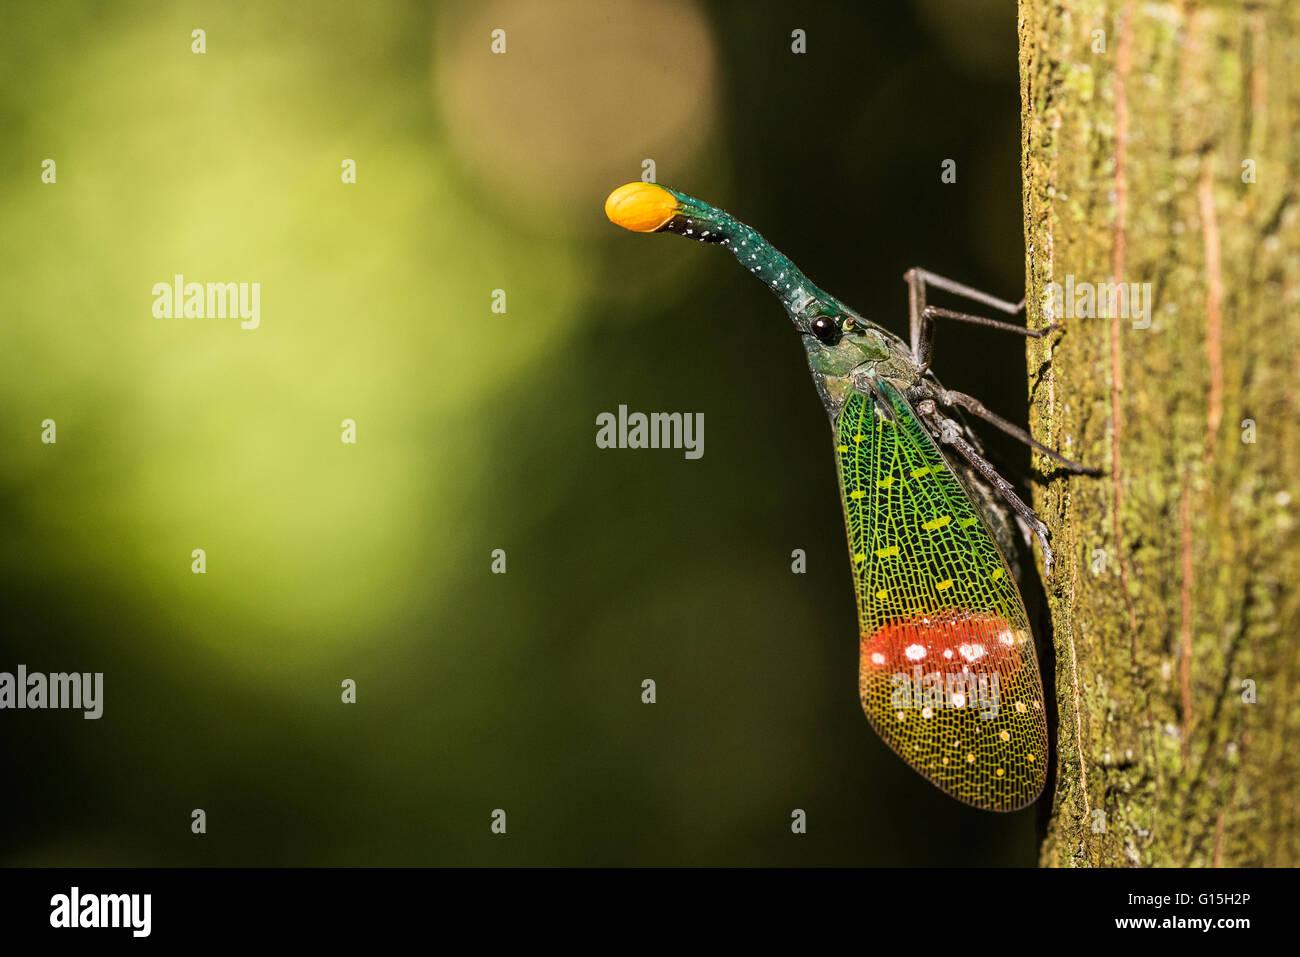 Orange-tip lantern fly (Pyrops intricata), Indonesia, Southeast Asia - Stock Image